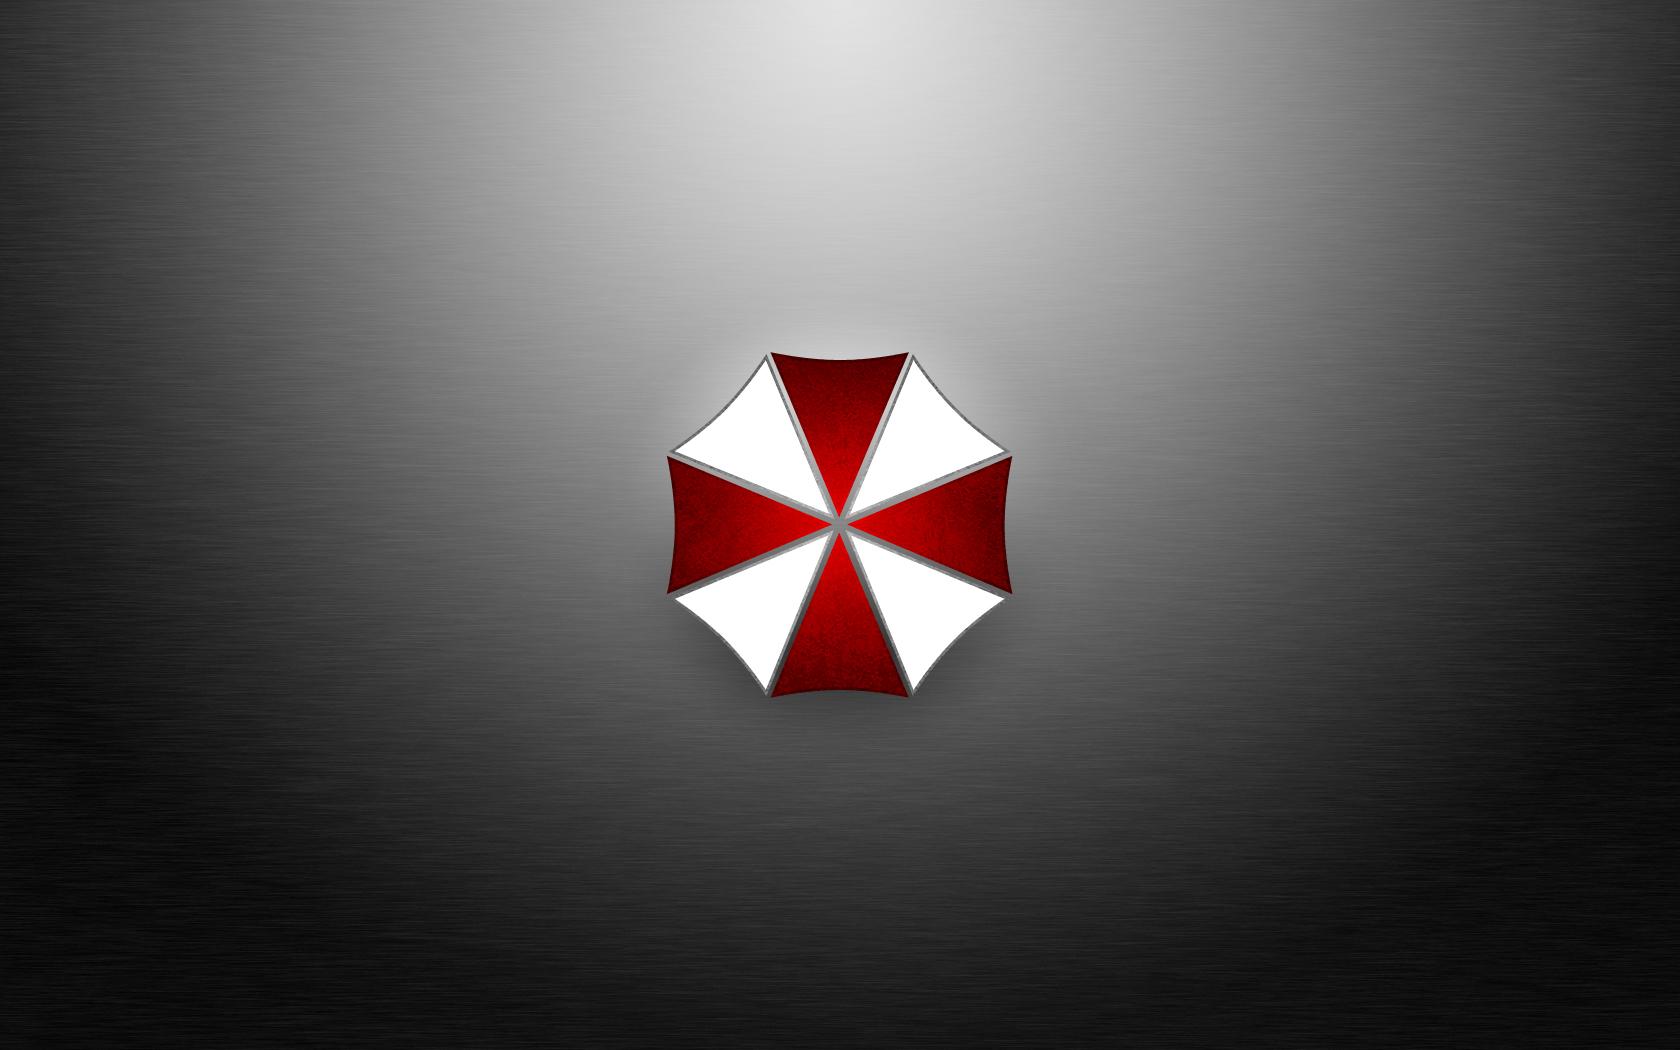 Wallpapers minimalistas en hd taringa - Umbrella corporation wallpaper hd 1366x768 ...